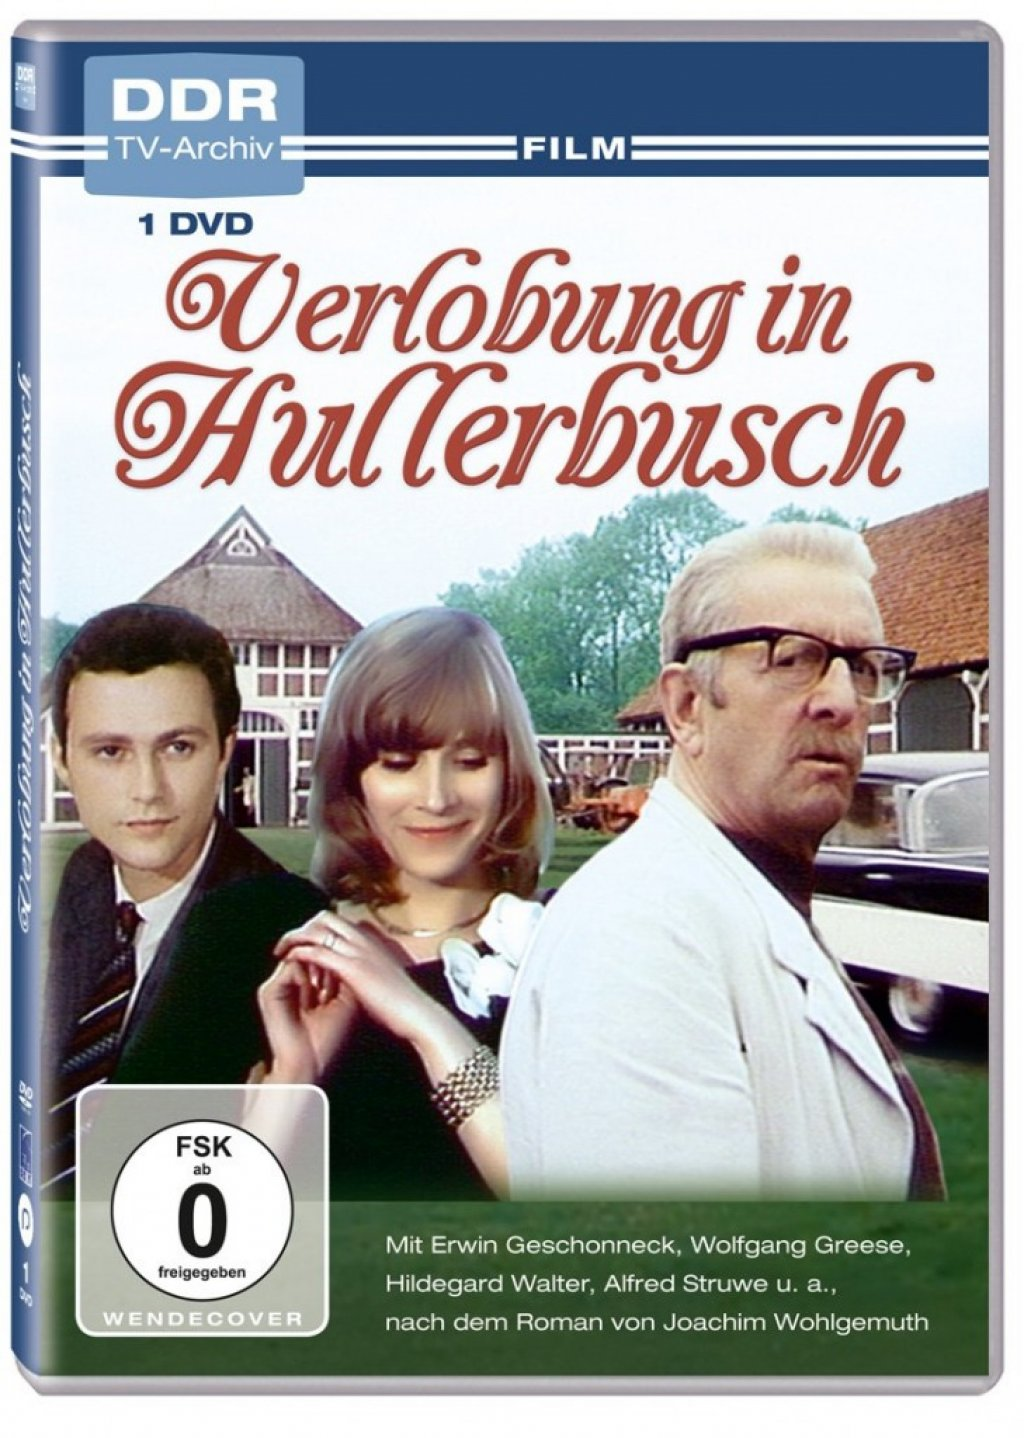 Verlobung in Hullerbusch - DDR TV-Archiv (DVD)